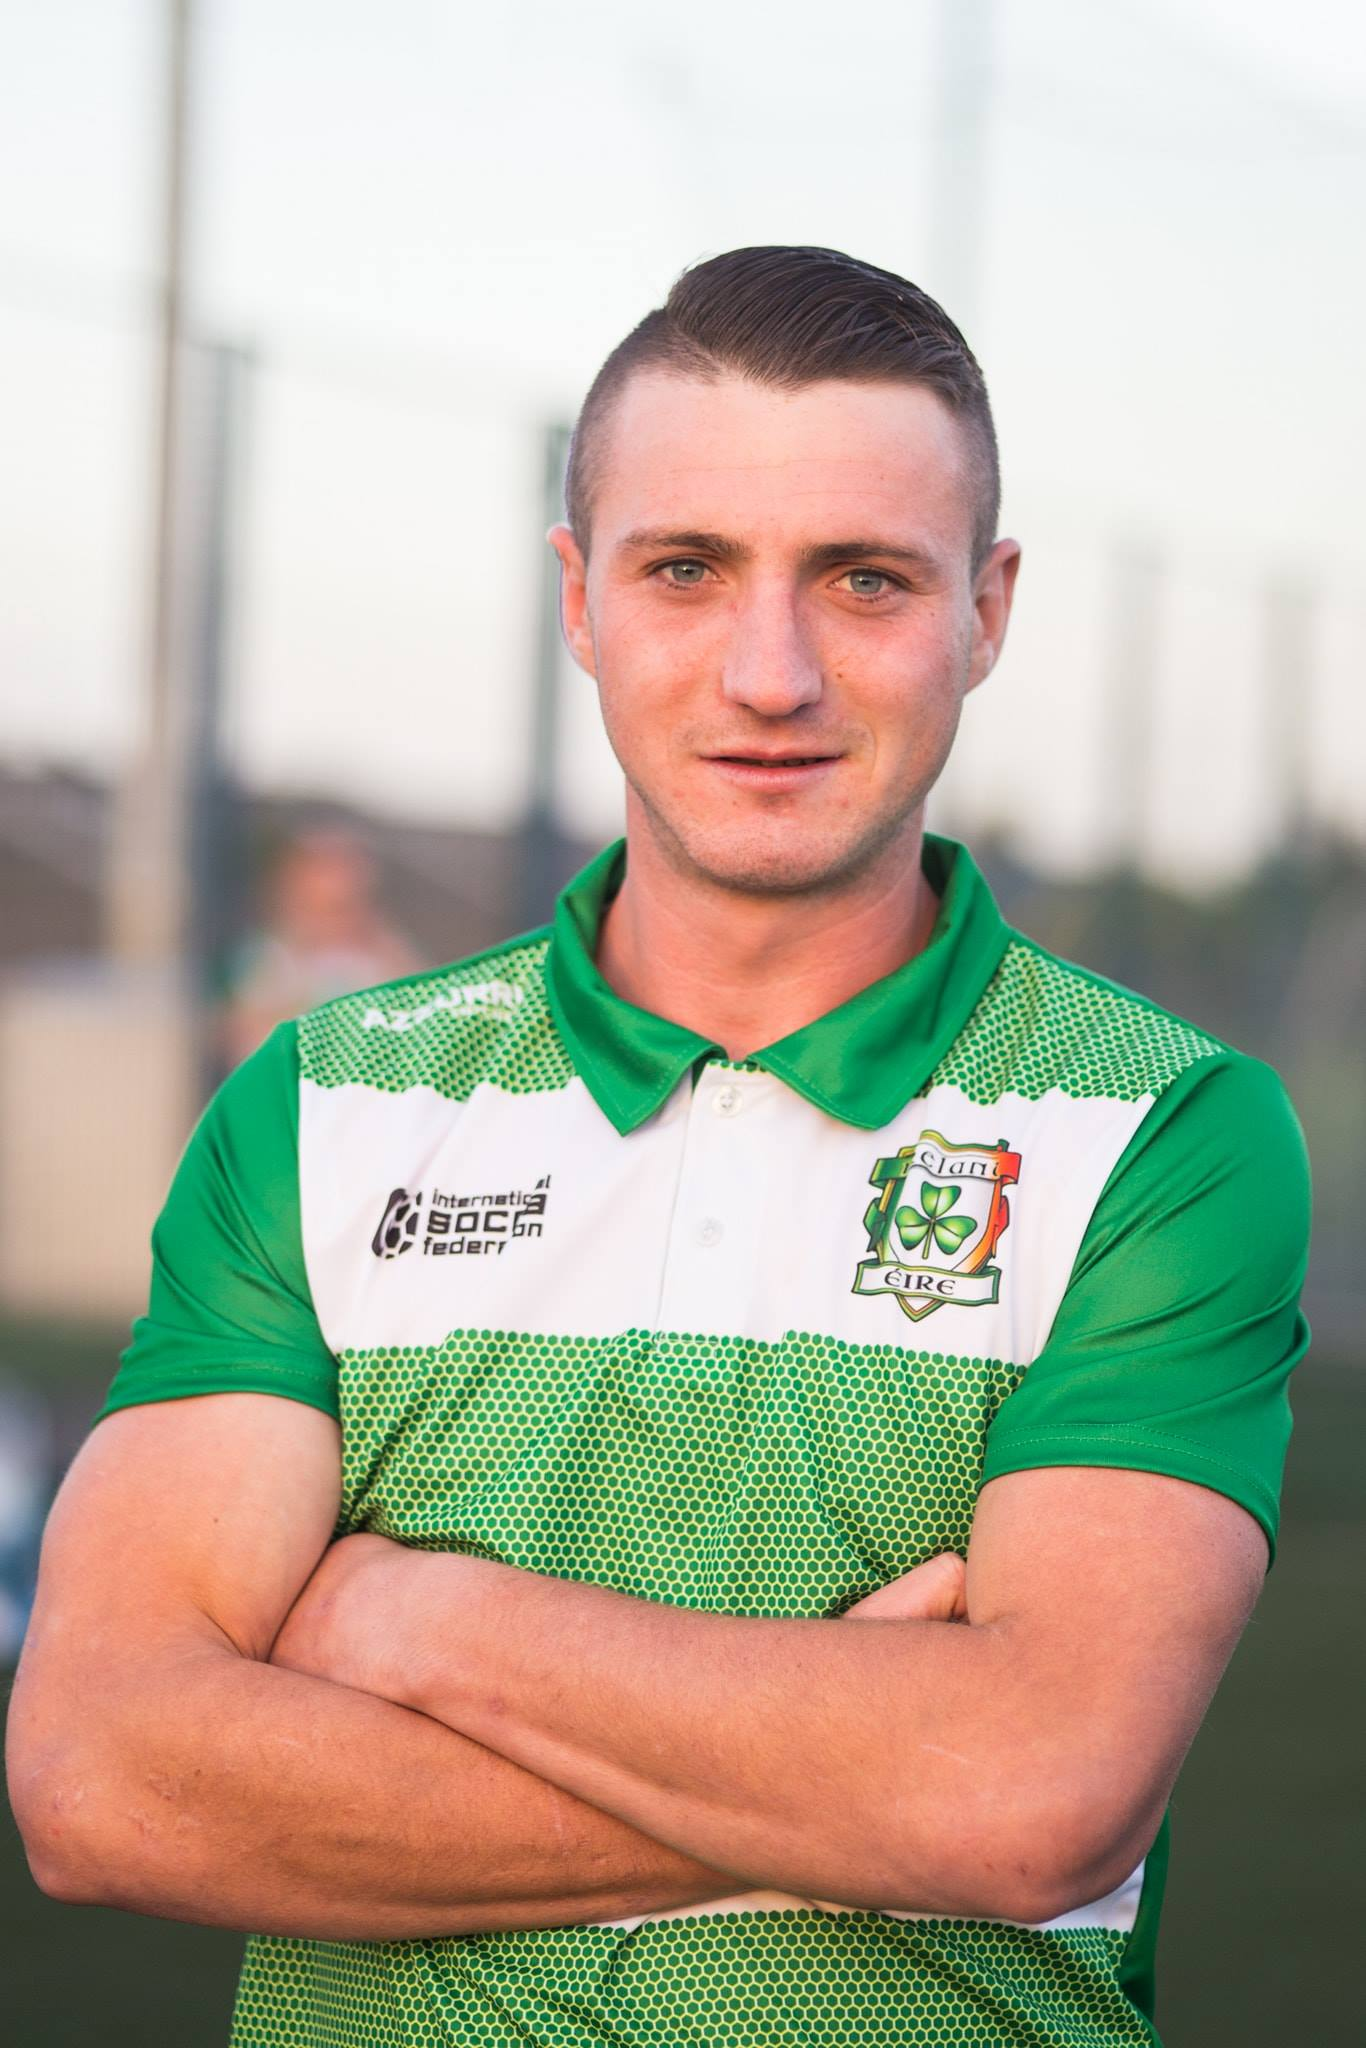 Jamie O'Donovan